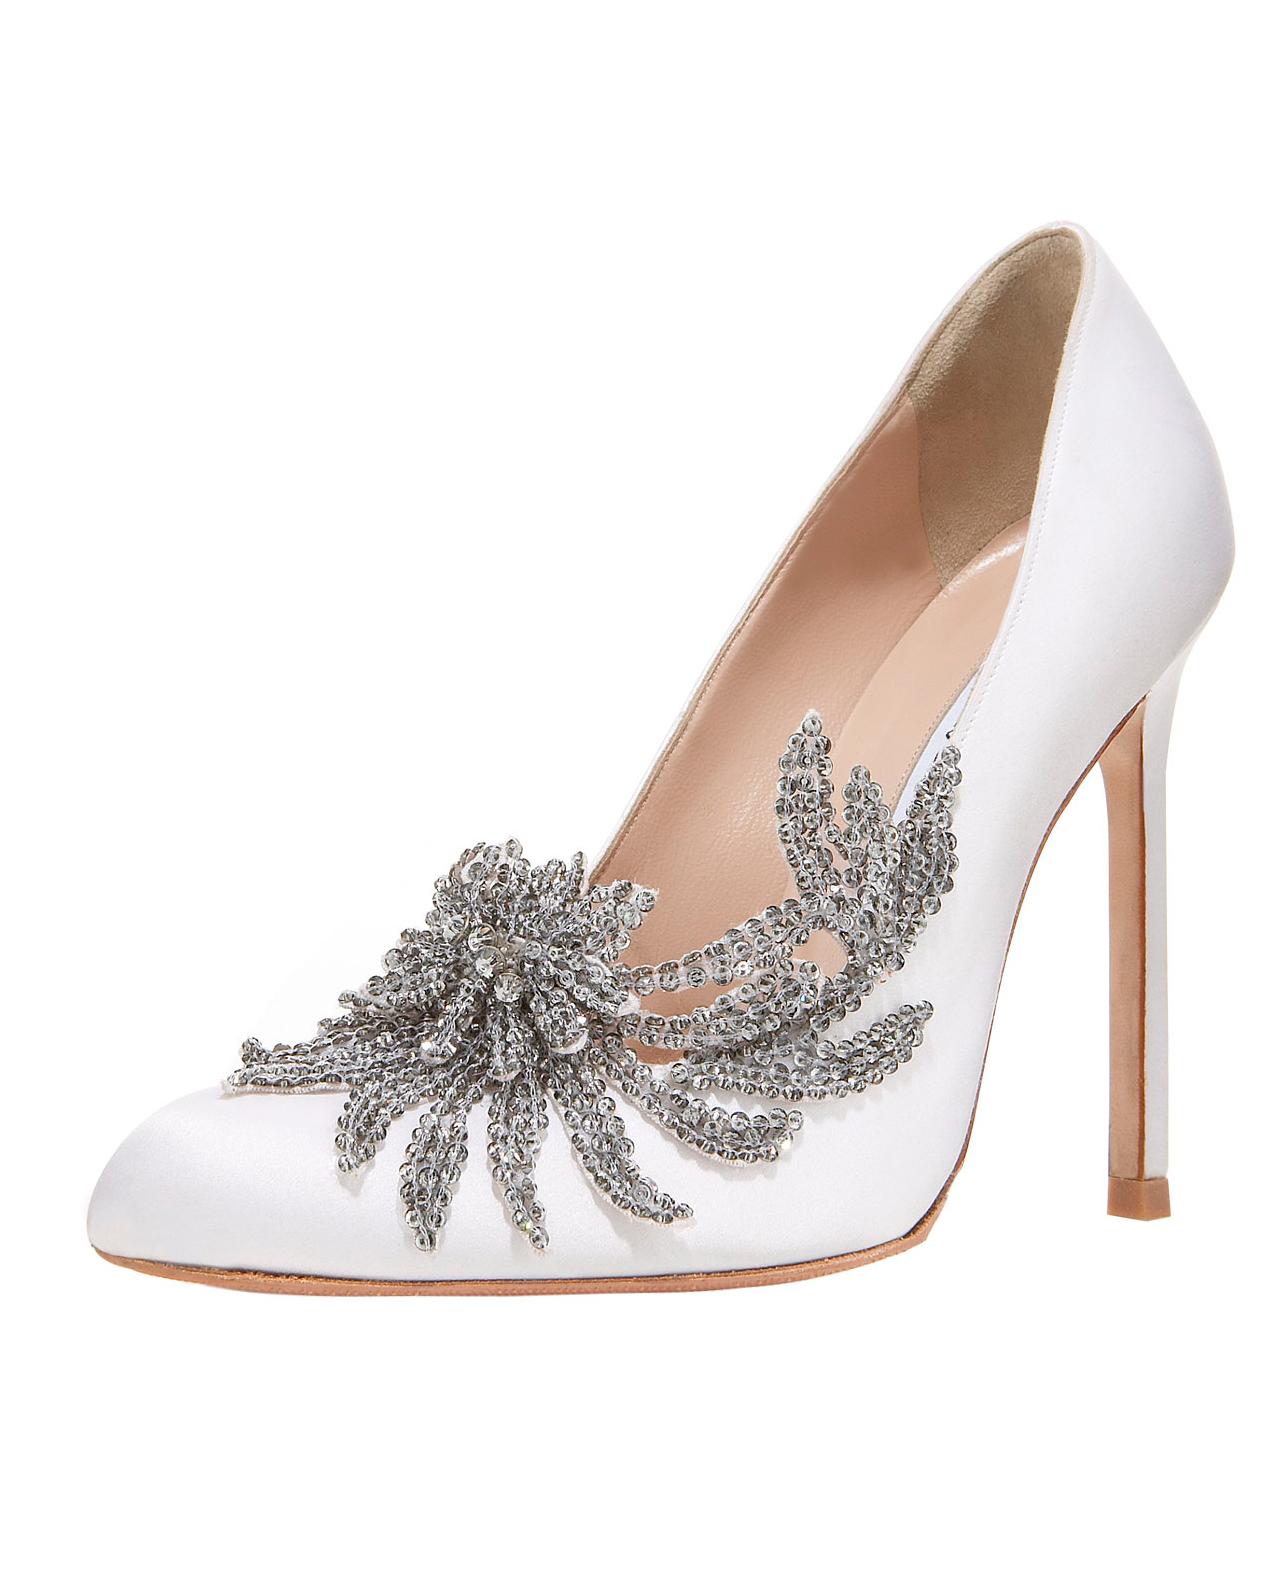 fall-wedding-shoes-manolo-blahnik-swan-0914.jpg